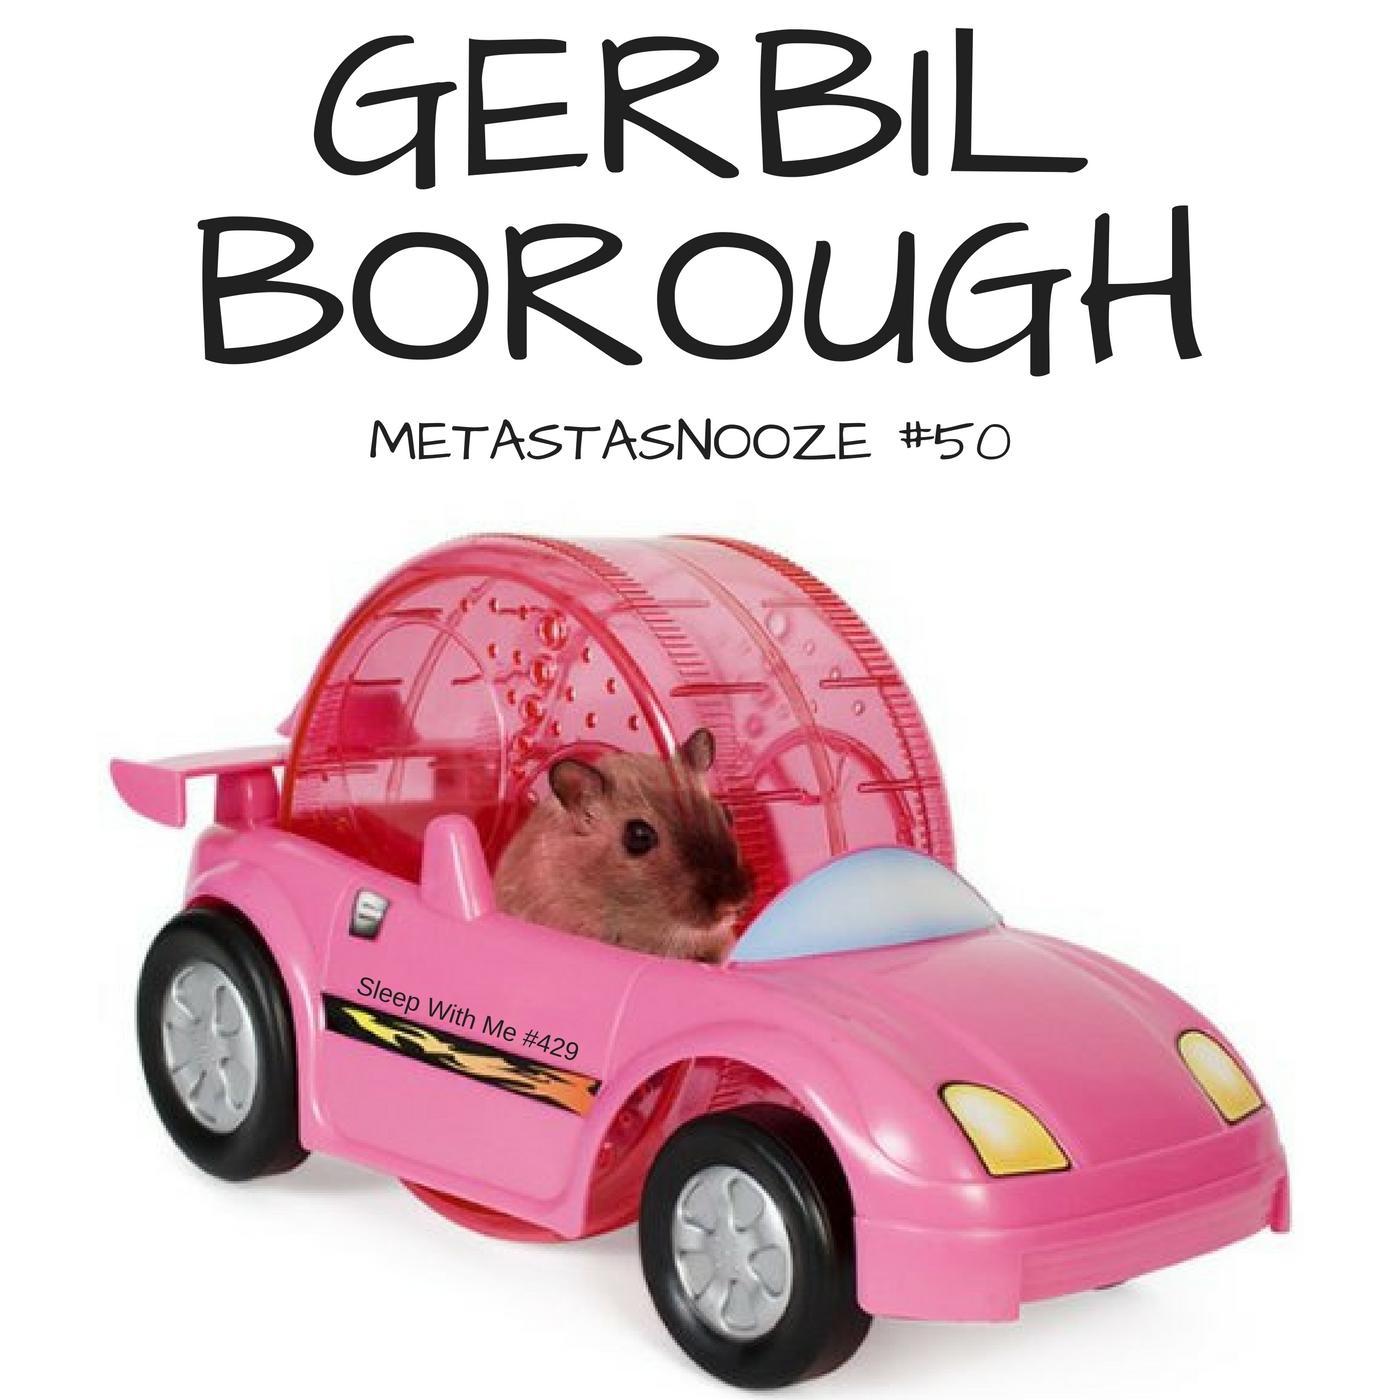 Gerbil Borough | Metastasnooze #50 | Sleep With Me #429